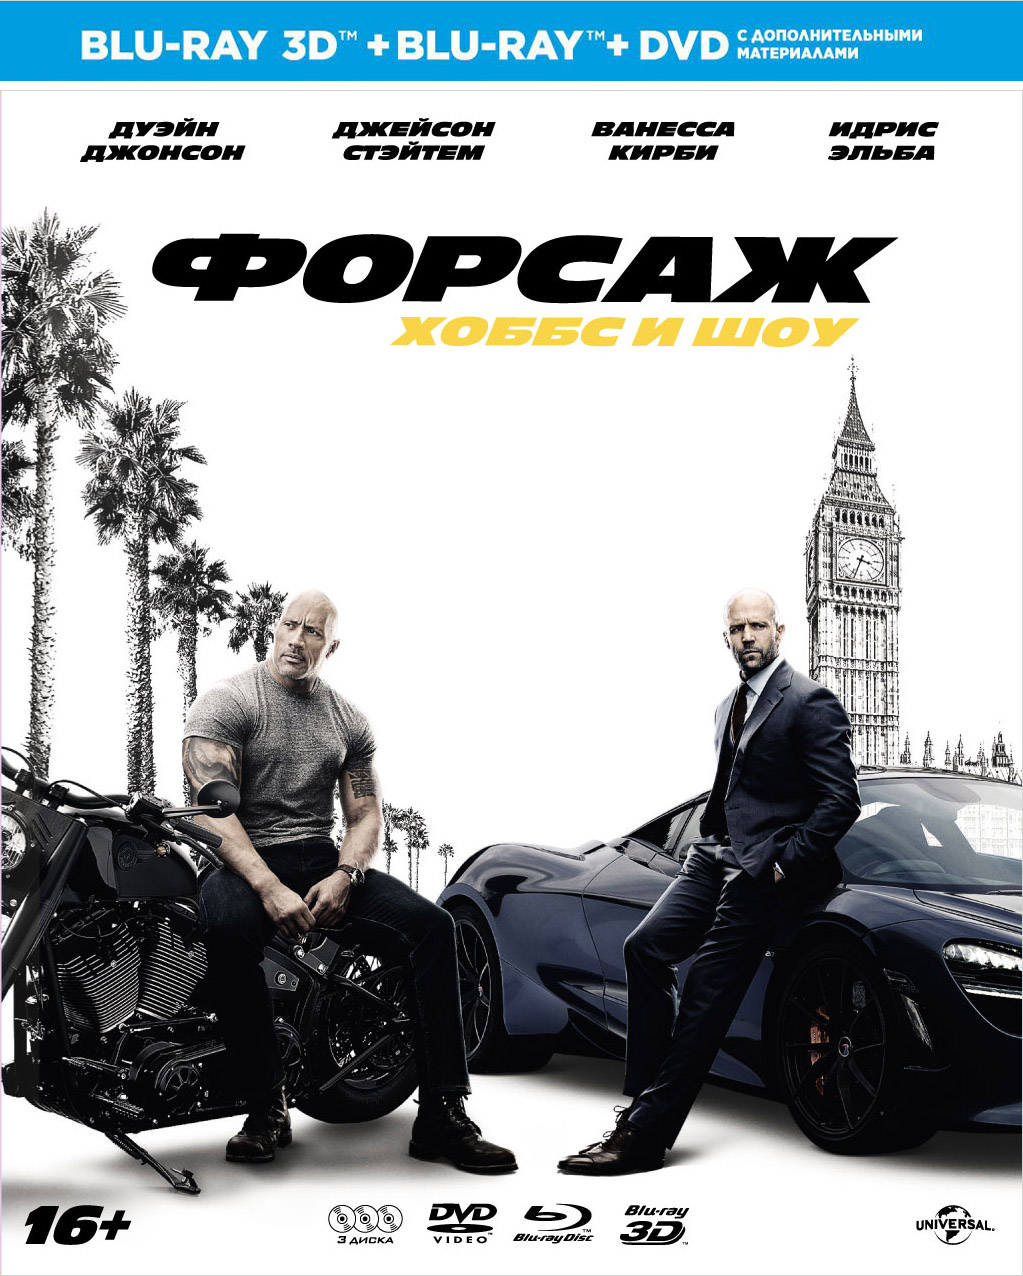 Форсаж: Хоббс и Шоу (Blu-ray 3D + 2D) (2 Blu-ray + DVD) фото